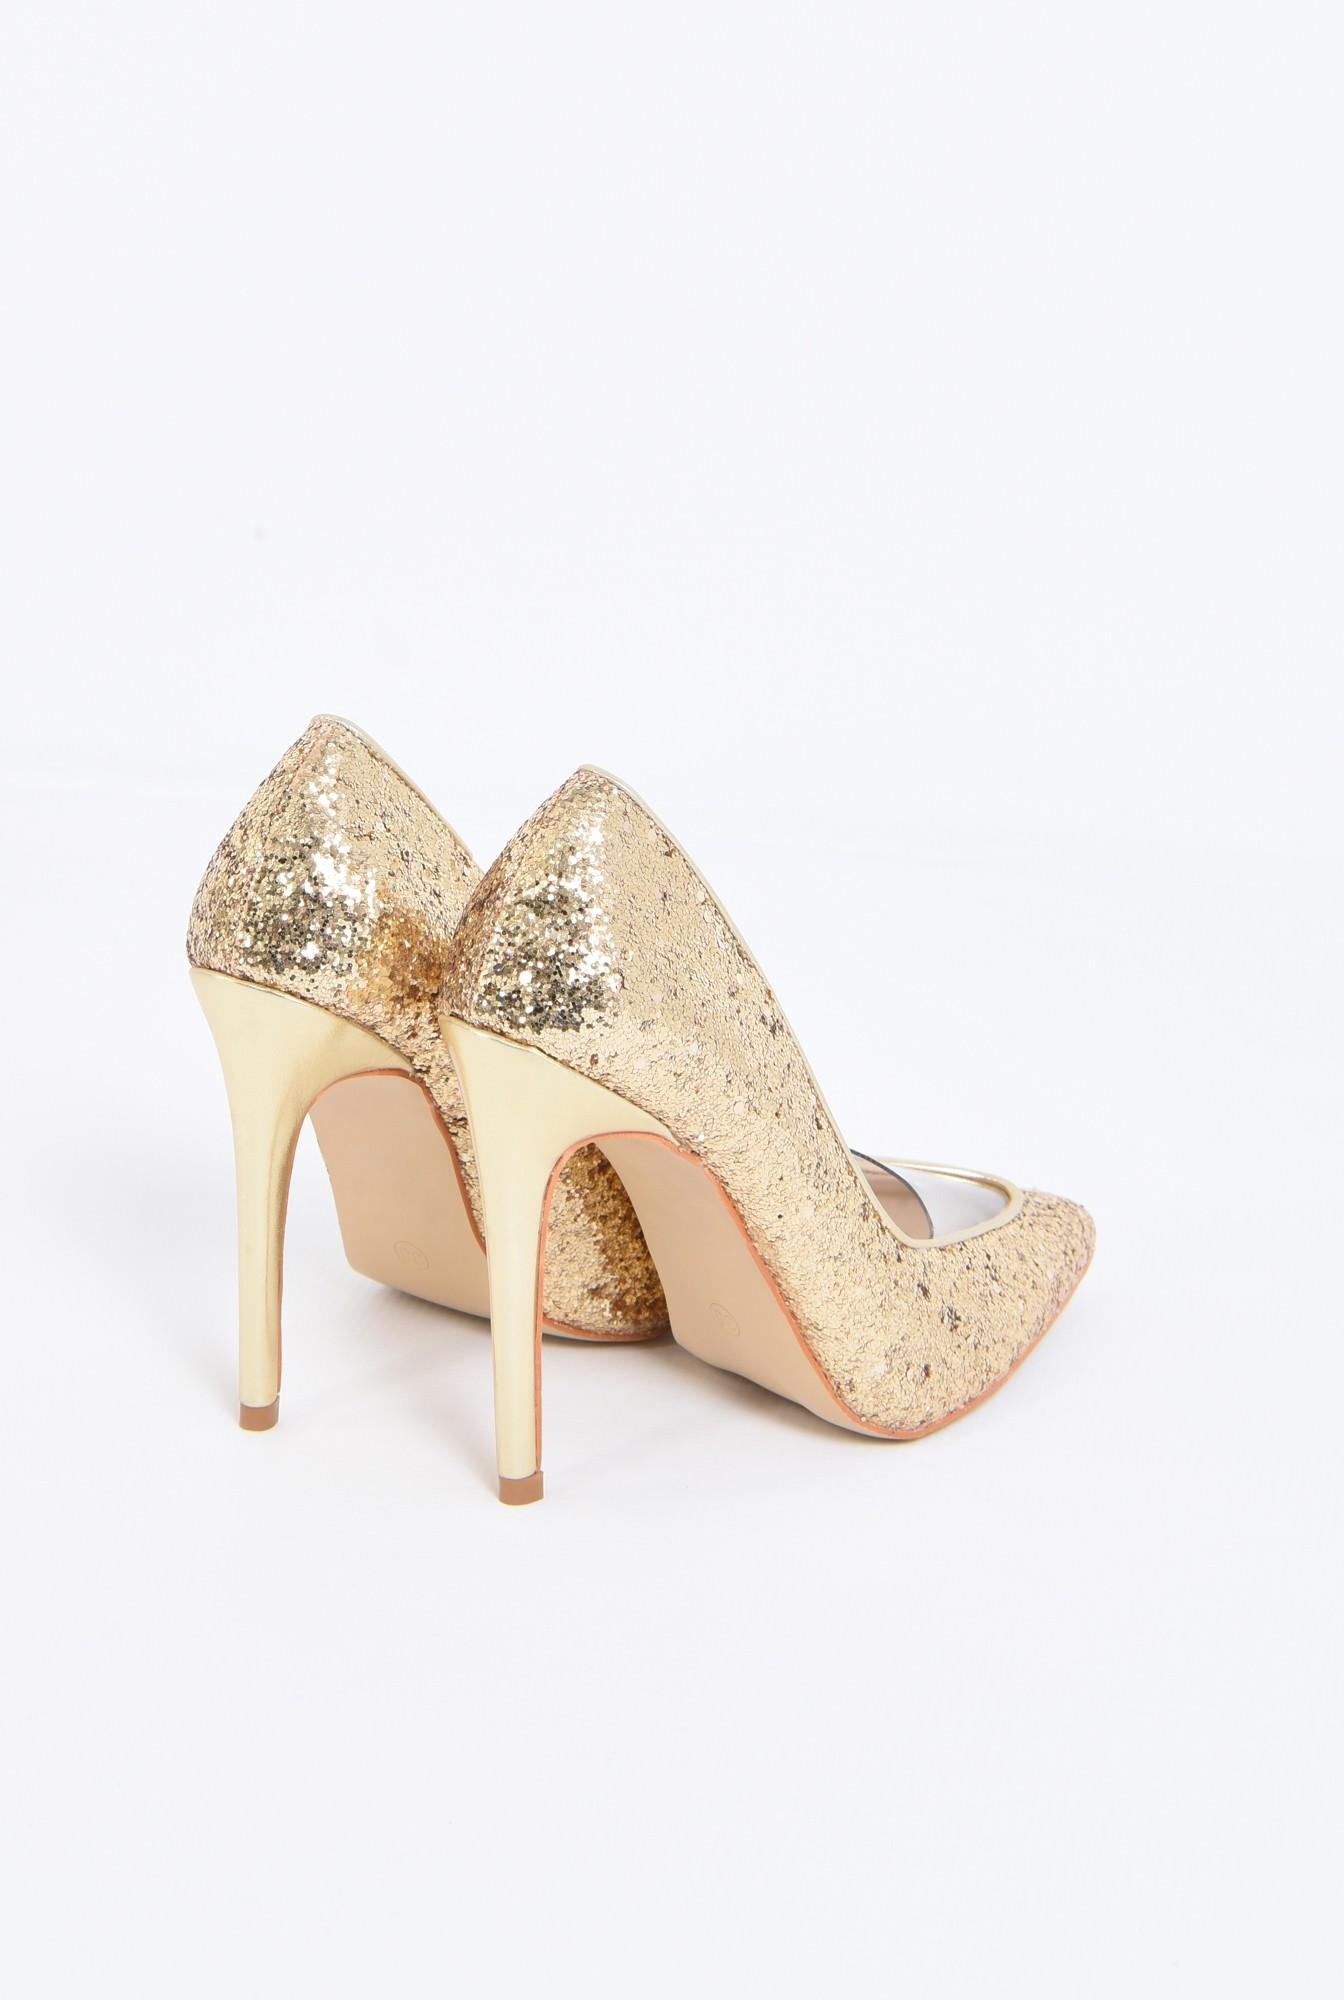 2 - pantofi eleganti, auriu, stiletto, glitter